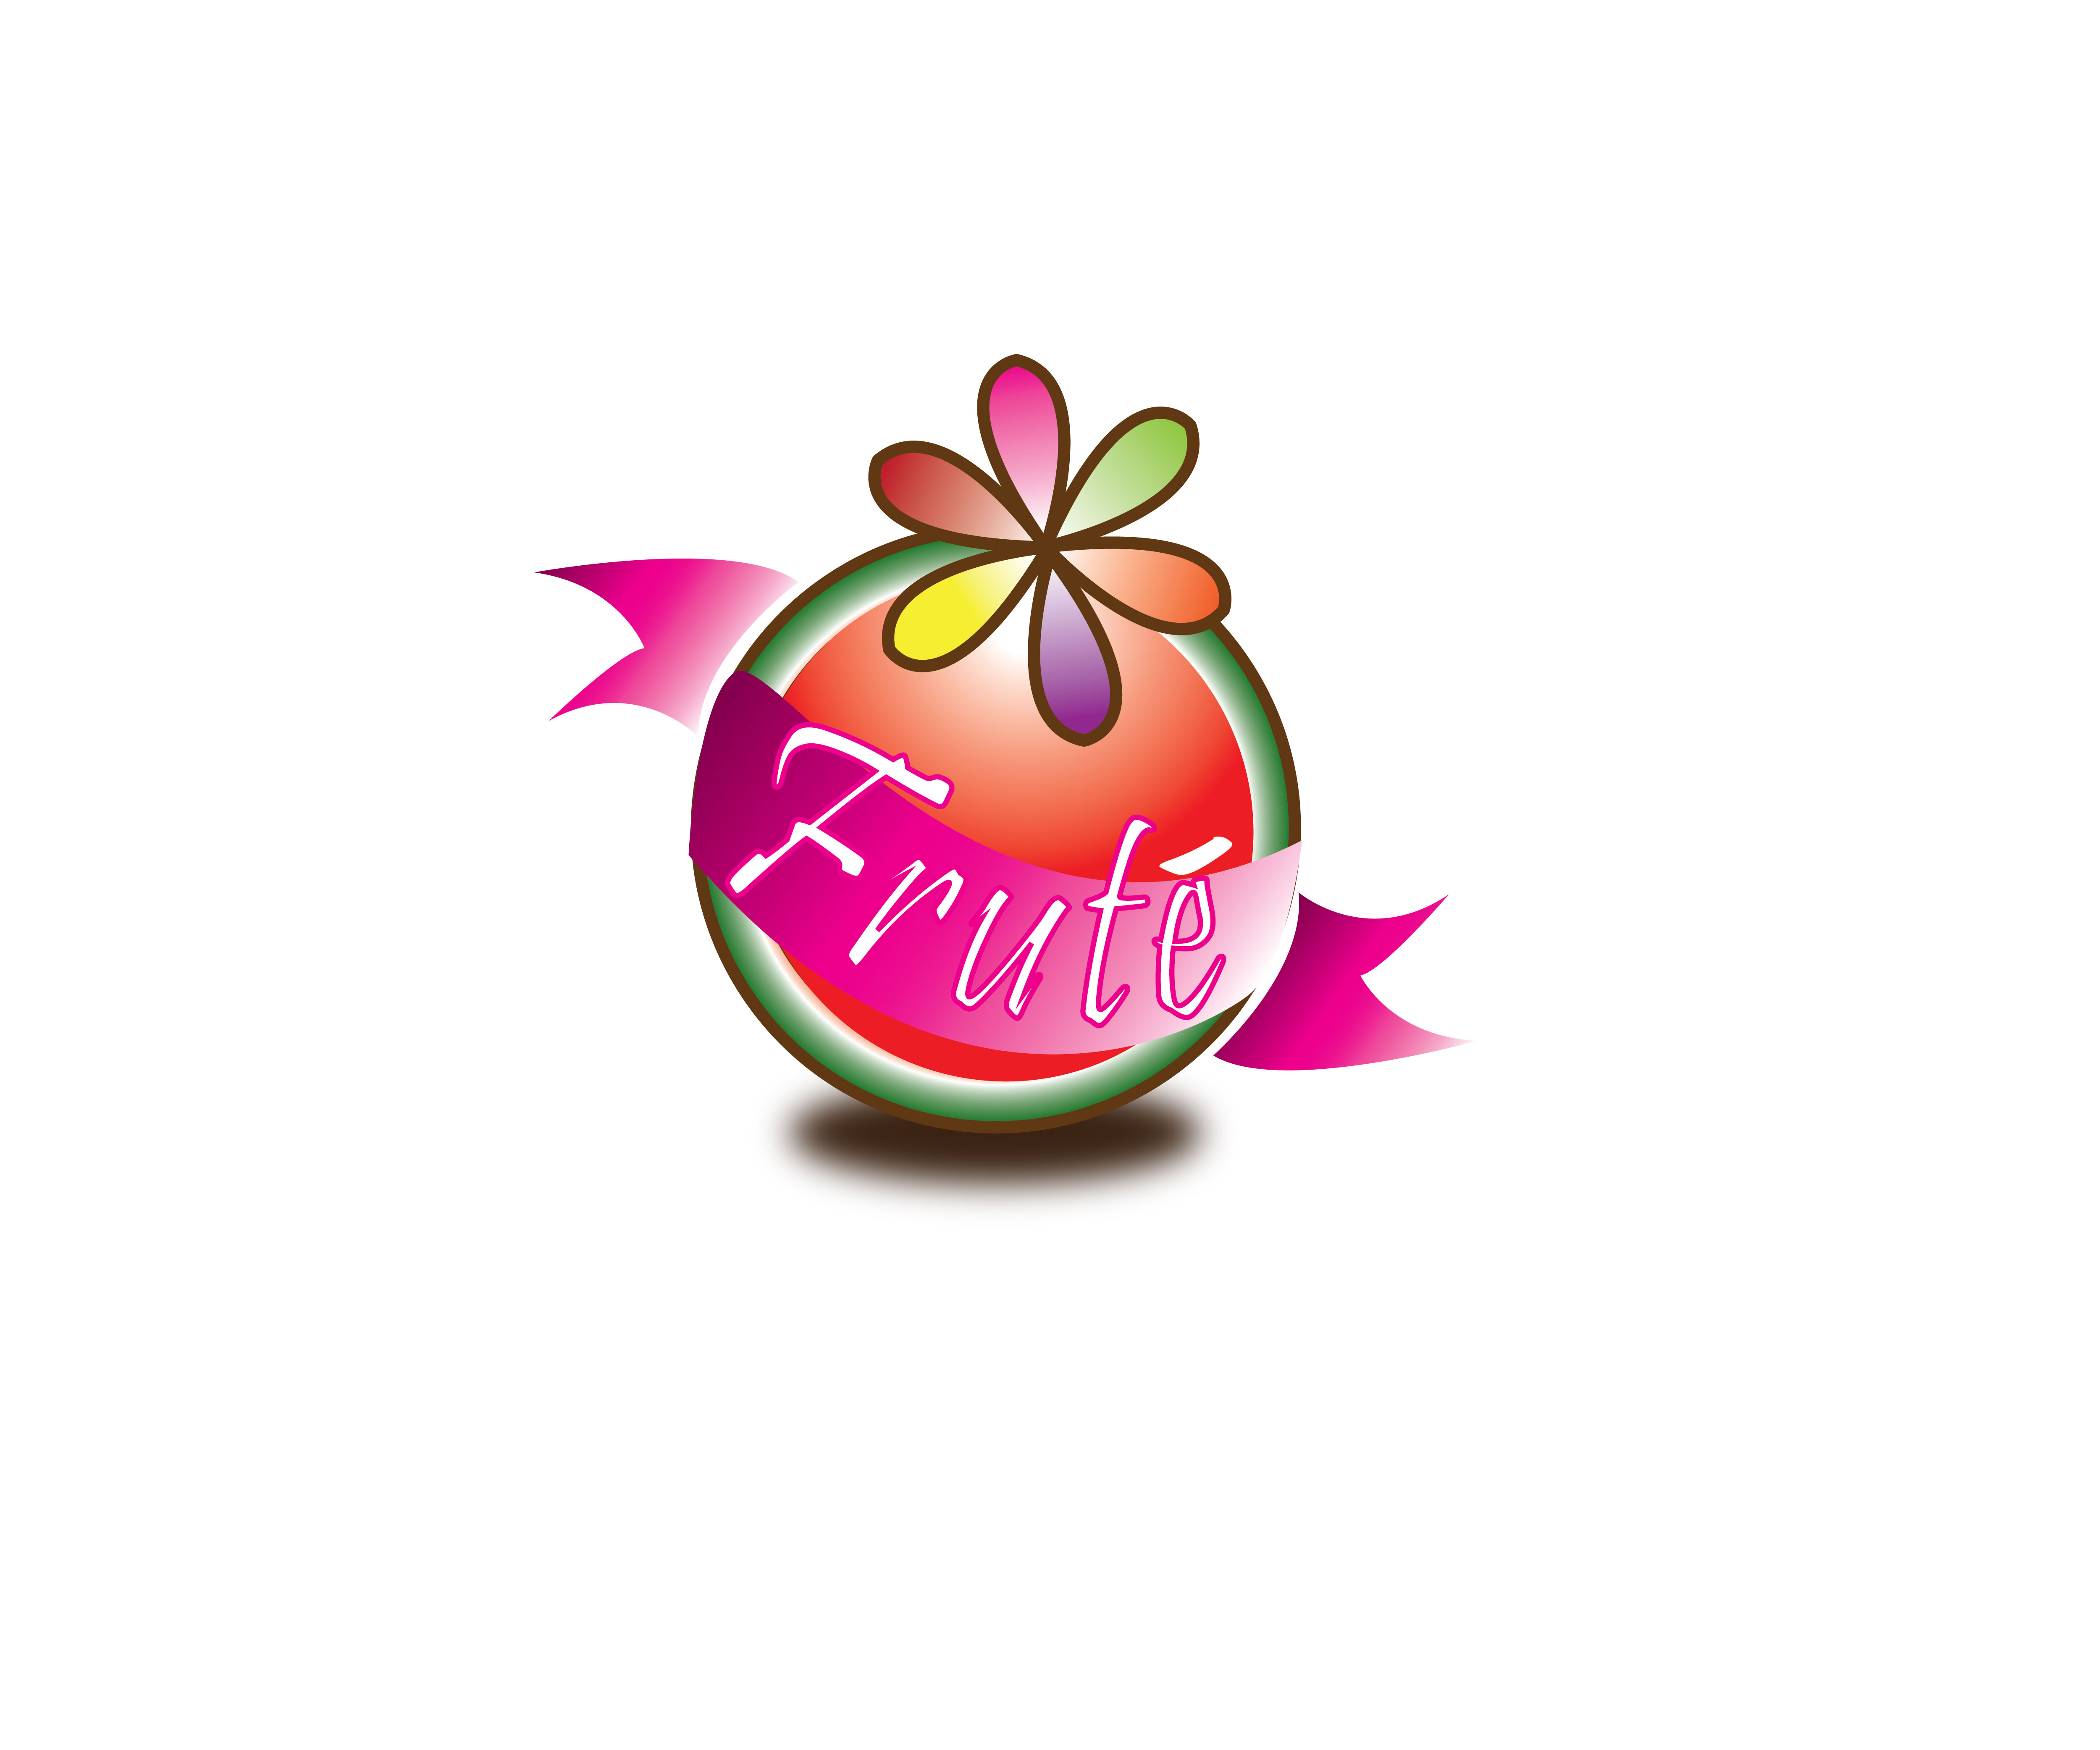 Logo Design by jhunzkie24 - Entry No. 77 in the Logo Design Contest Imaginative Logo Design for Fruté.